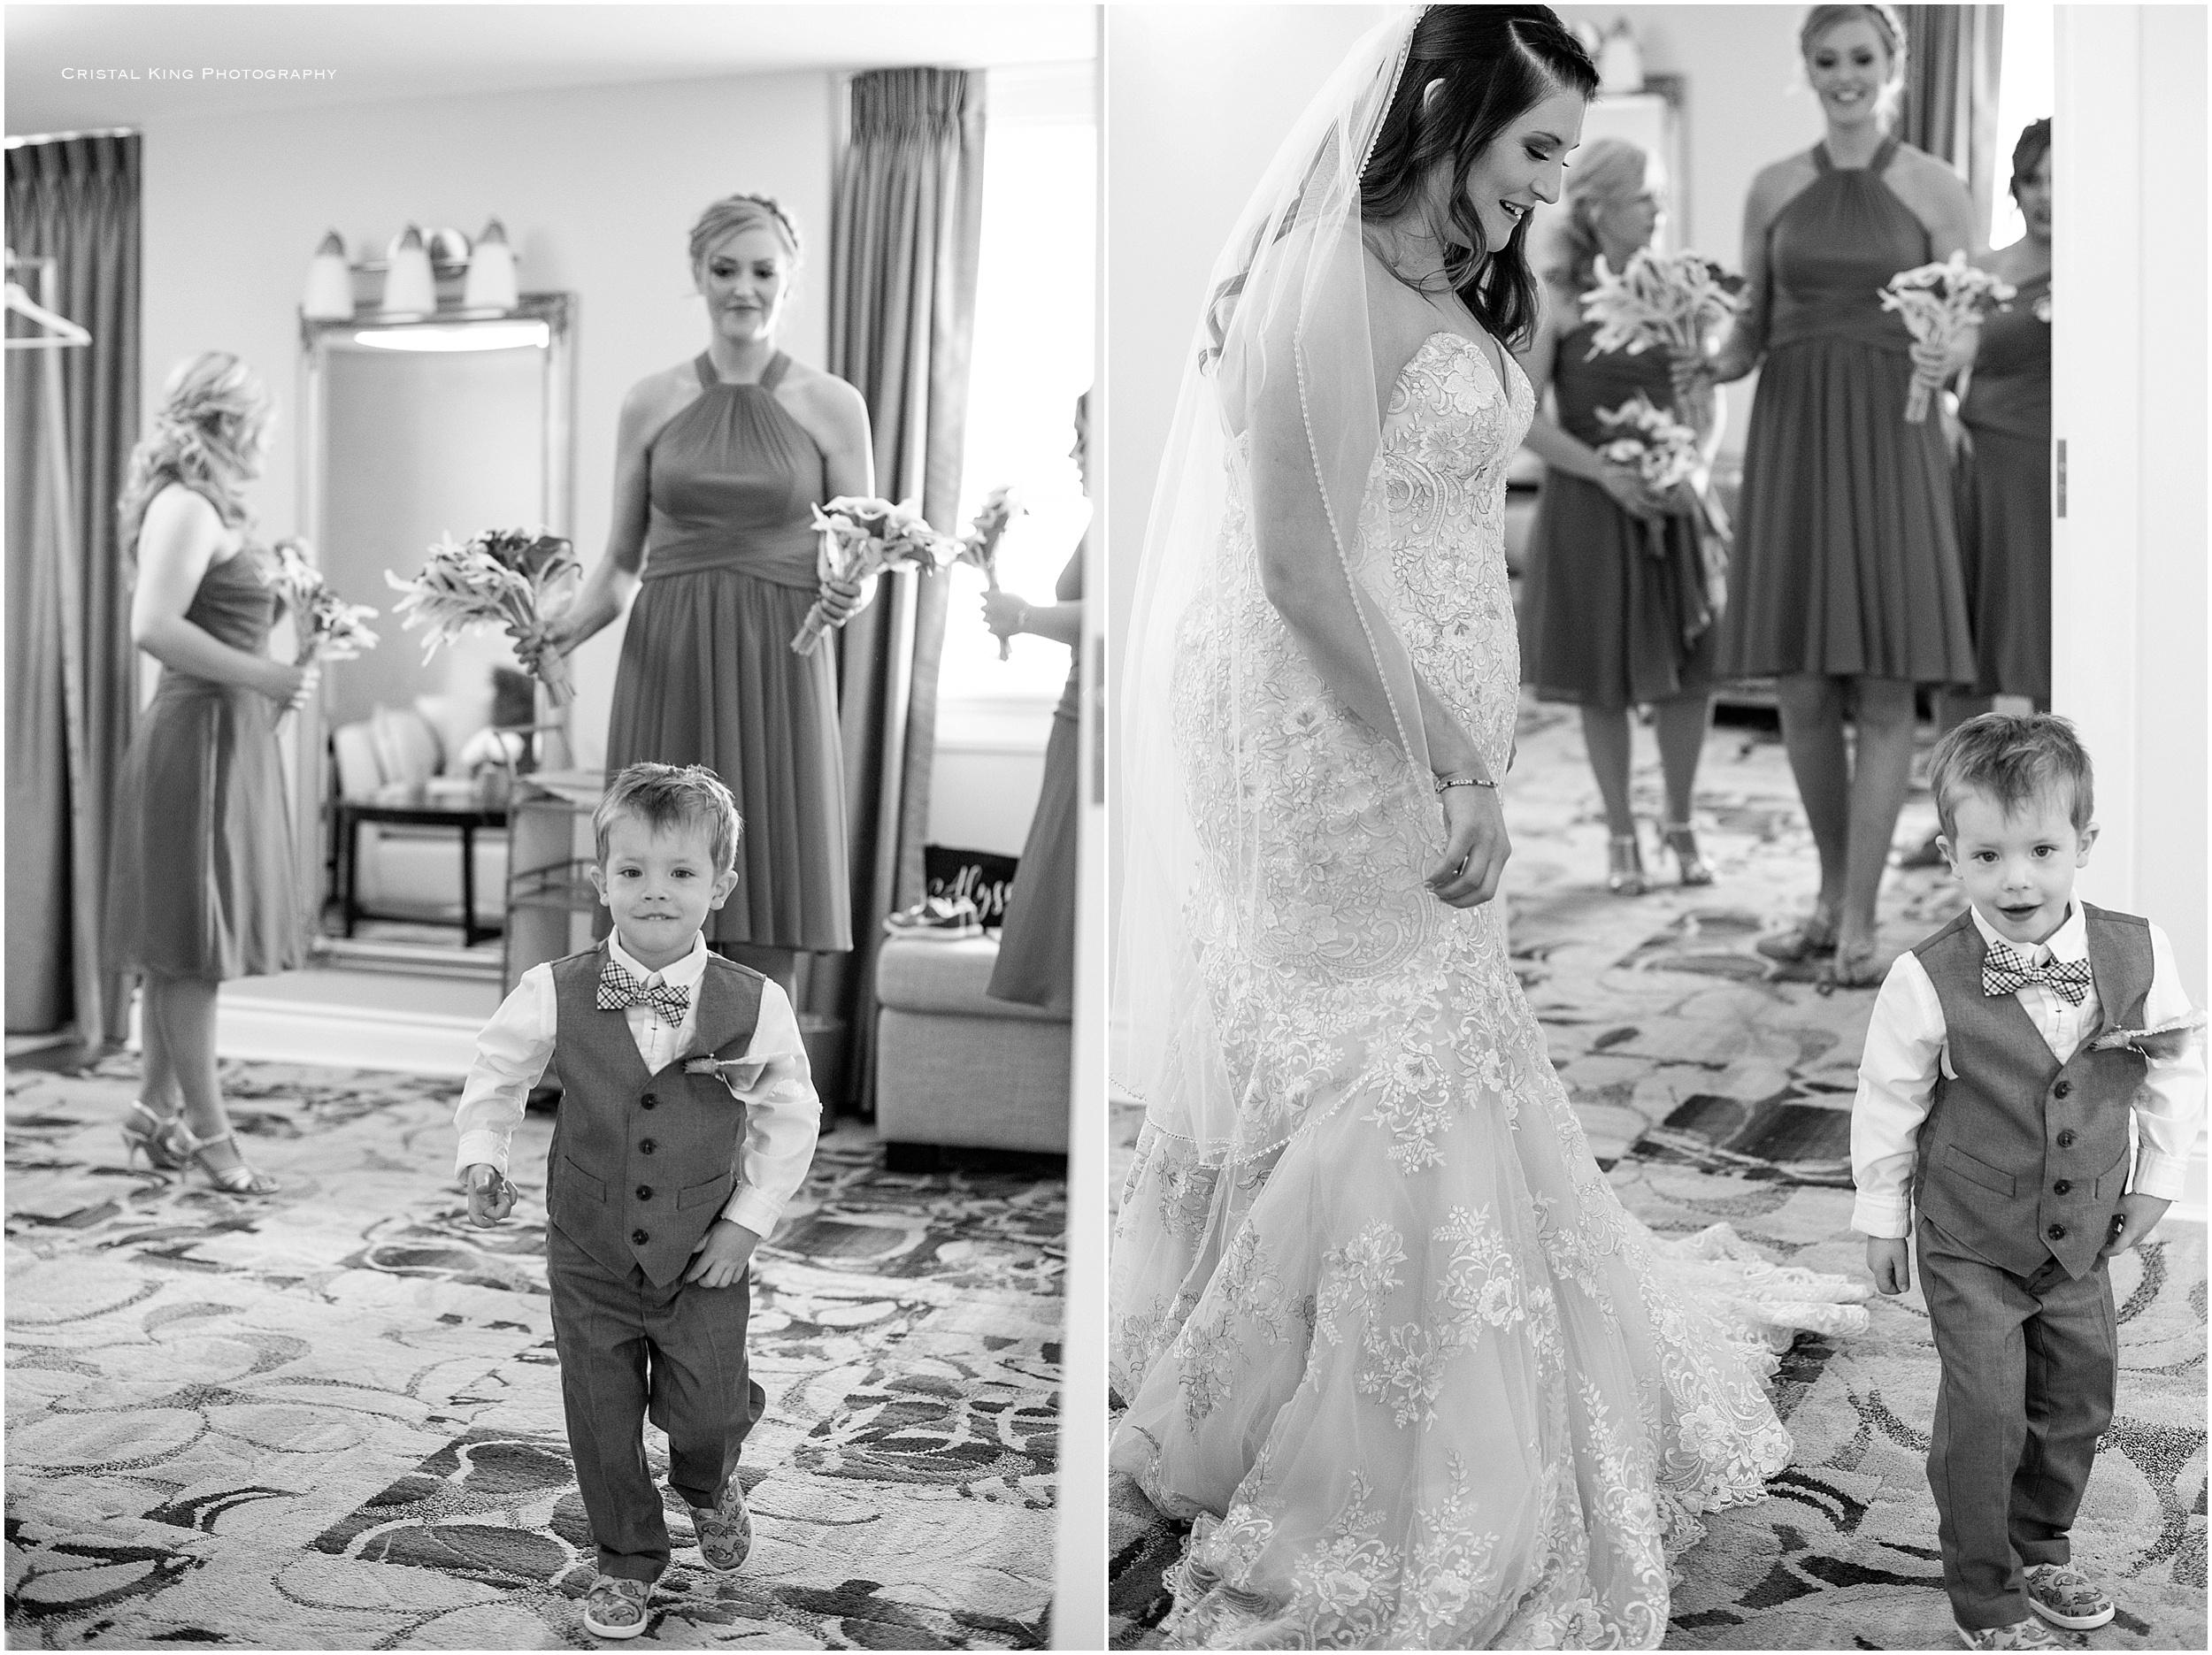 Myla & Grant Wedding-21.jpg